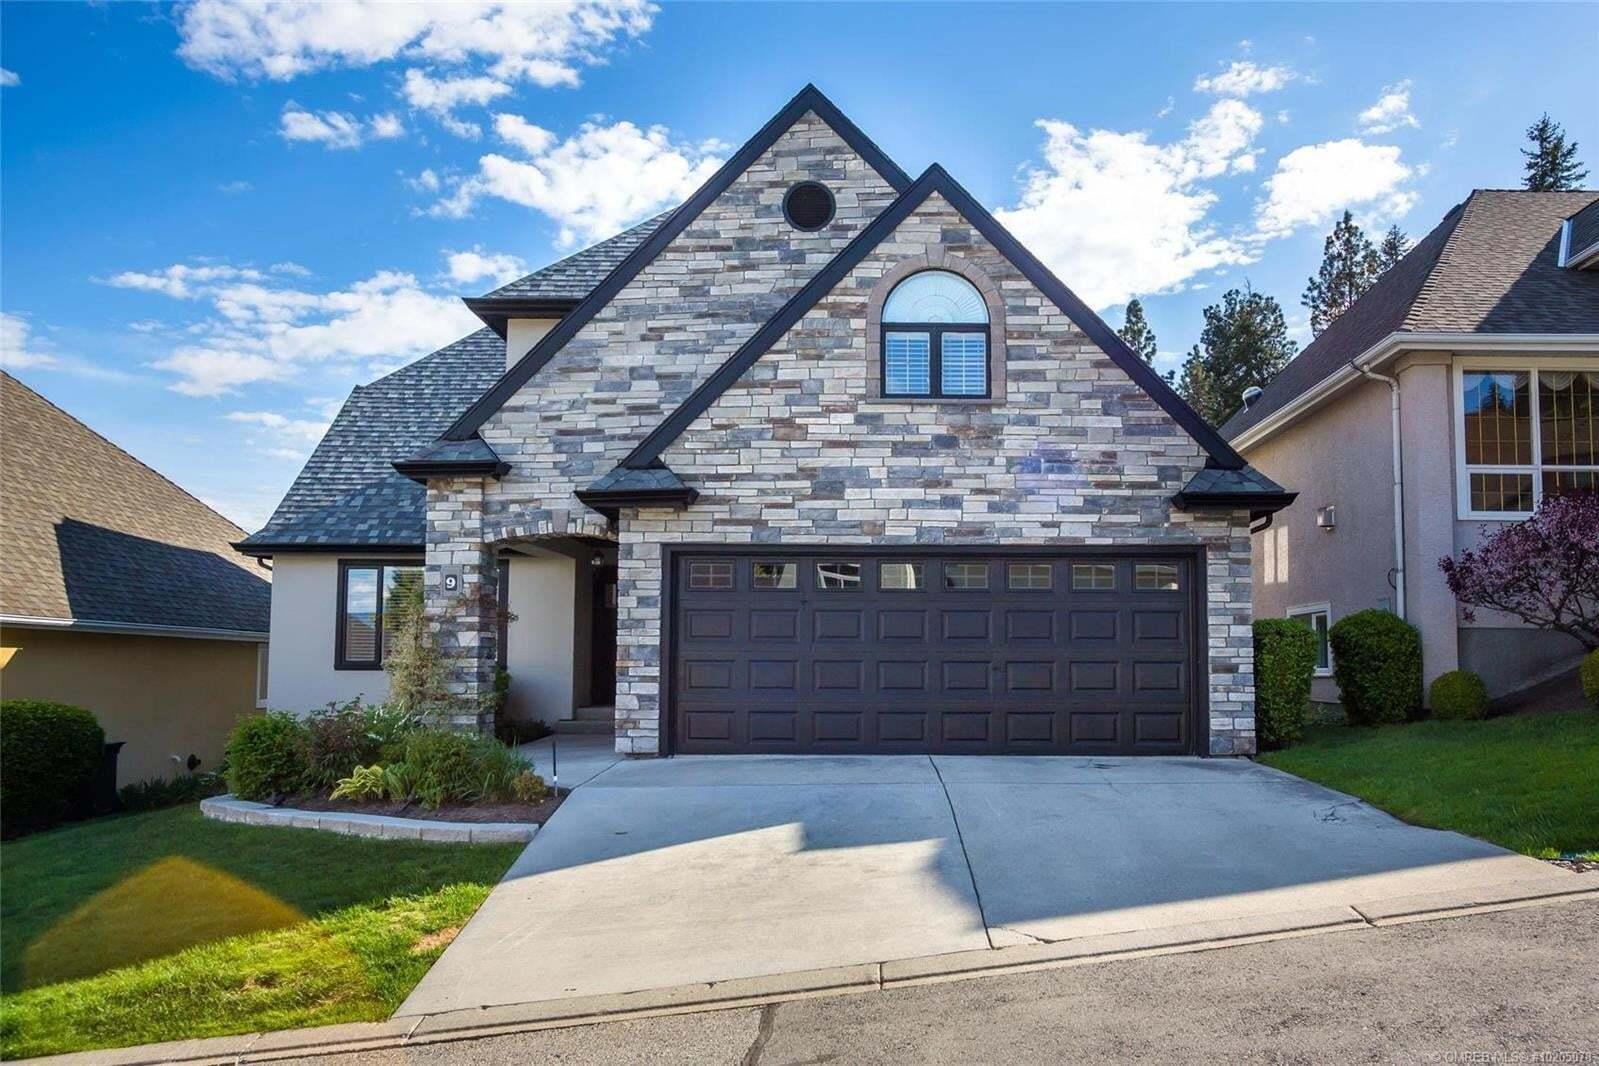 House for sale at 450 Yates Rd Kelowna British Columbia - MLS: 10205078